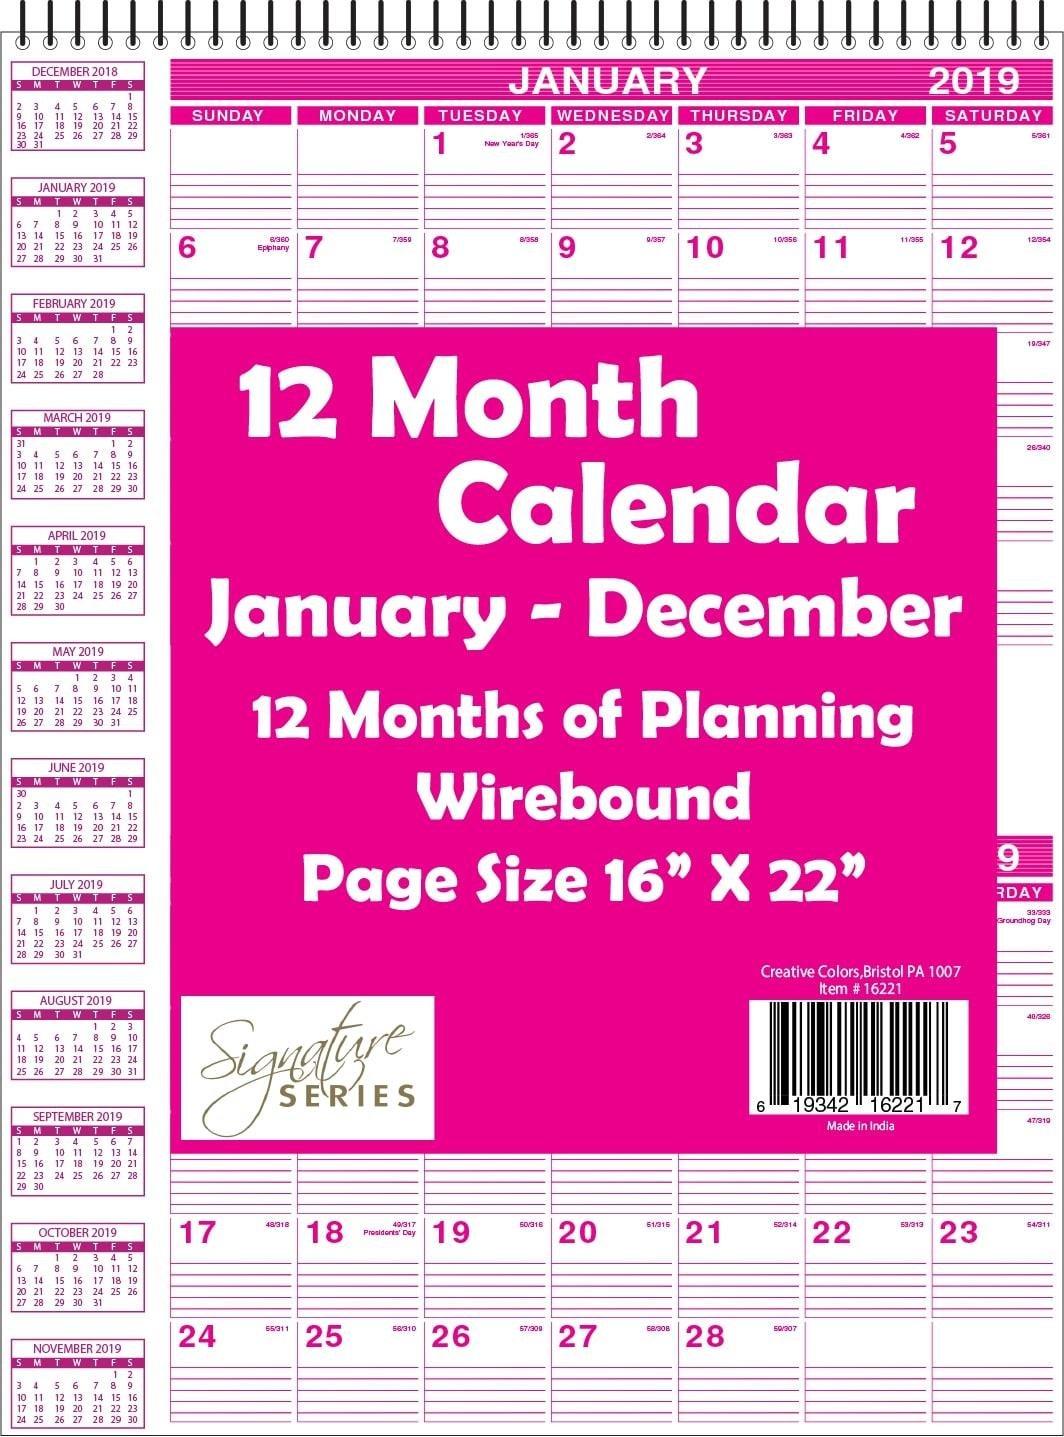 "Bulk Carton 16"" X 22"" Top Wired Wall Calendar 2019  Minimum Order 1 Calendar 2019 Bulk"